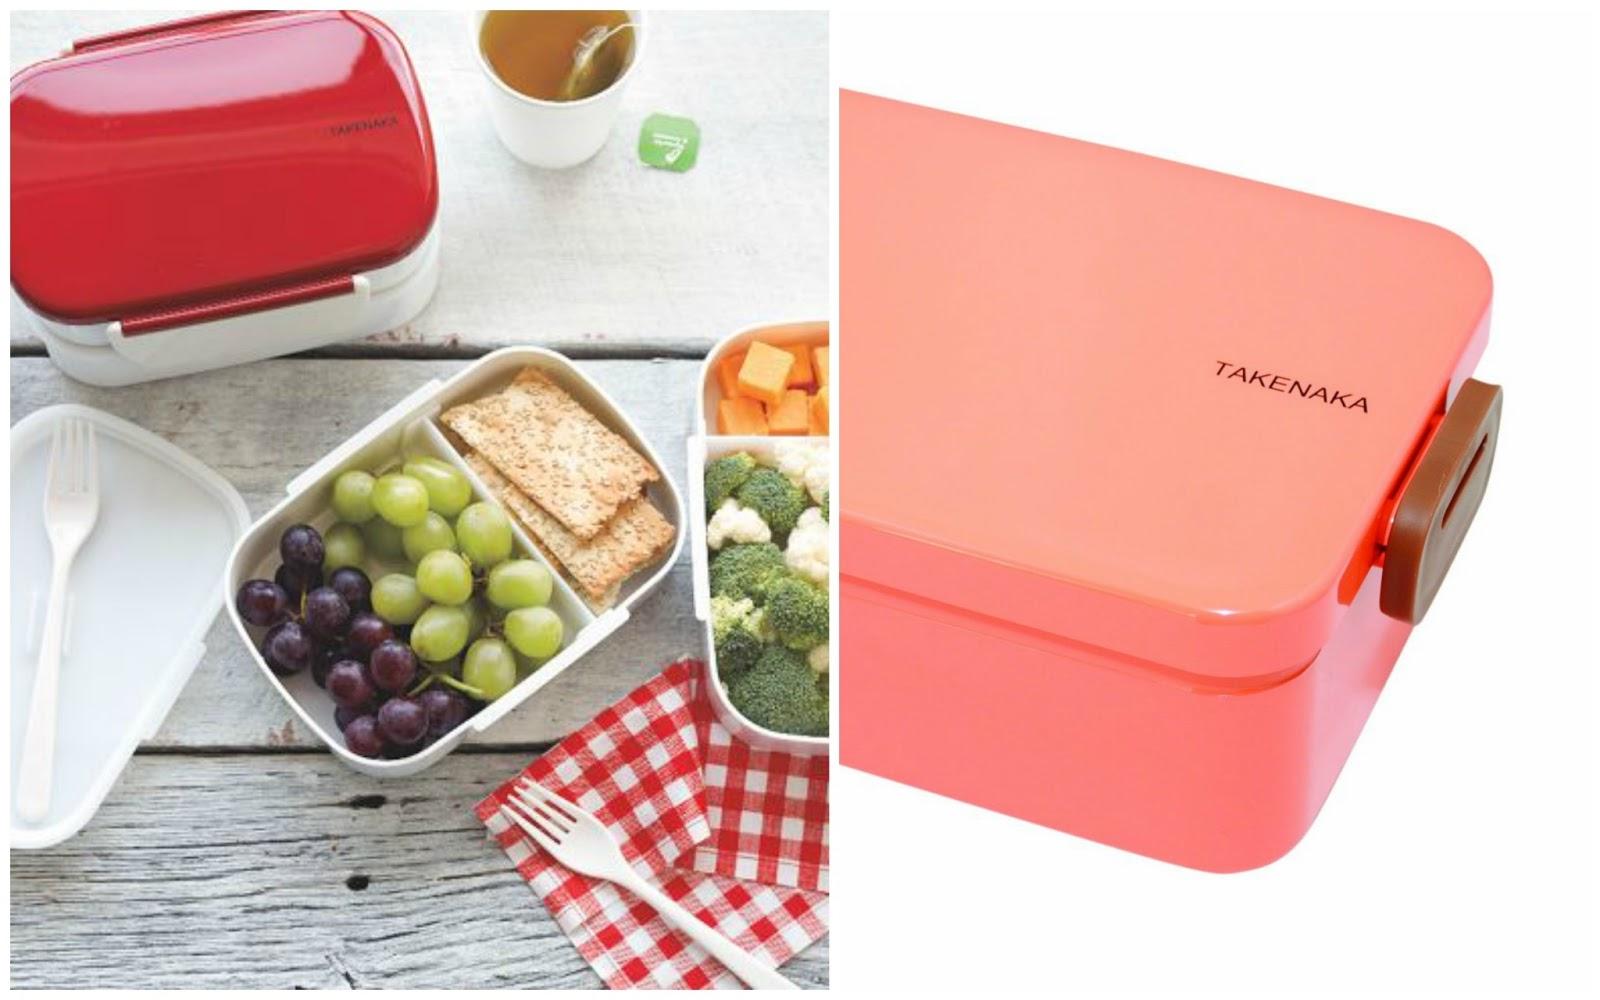 takenaka lunch box gt fashion diary